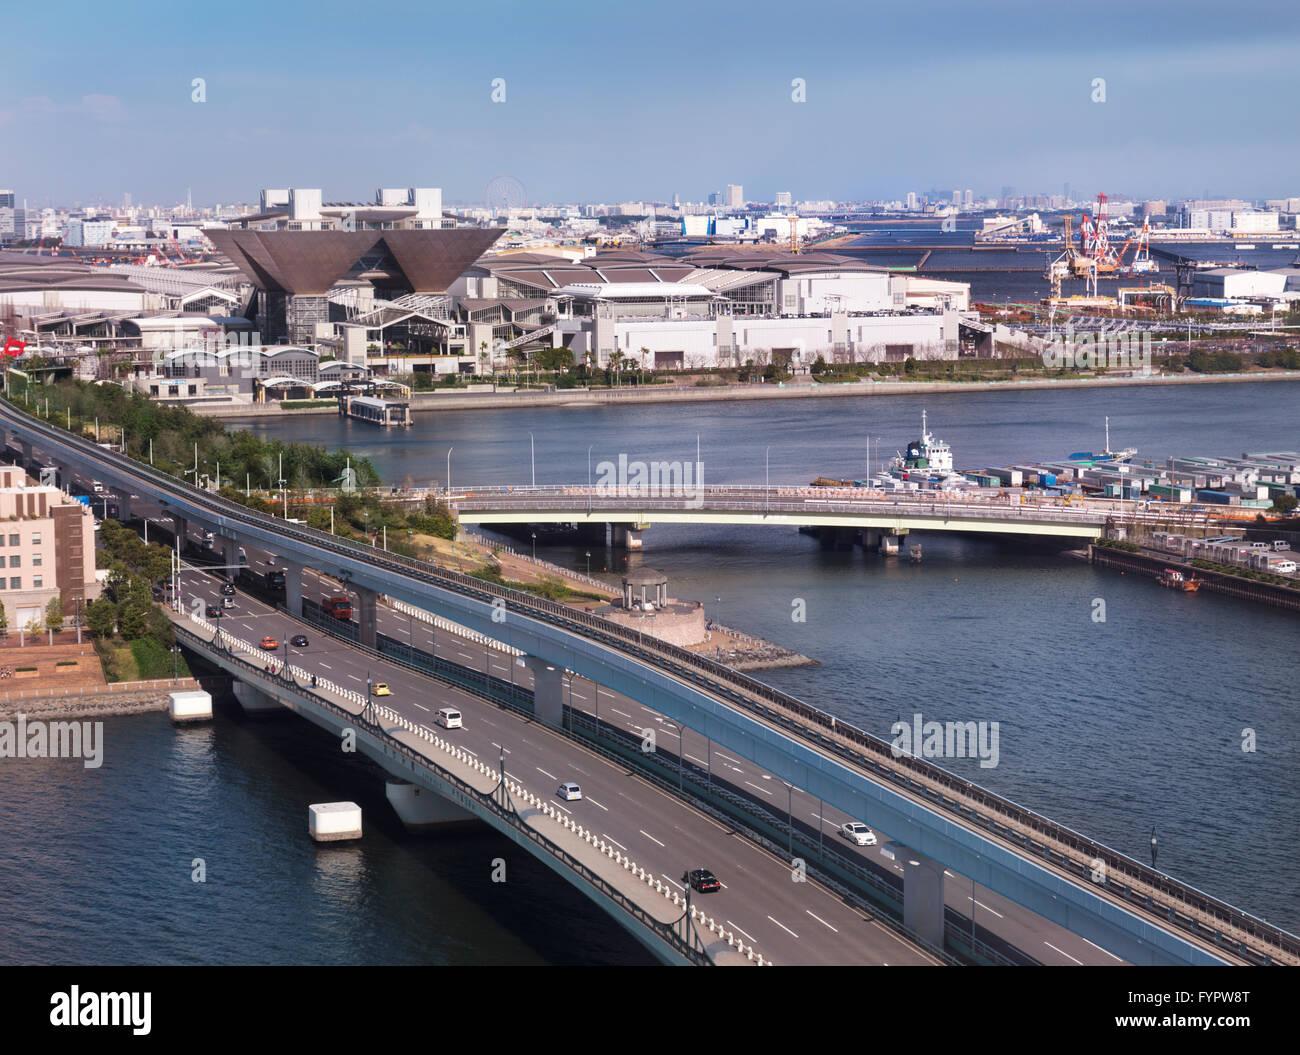 Tokyo Big Sight, International Exhibition Center, Odaiba, Tokyo, Japan - Stock Image